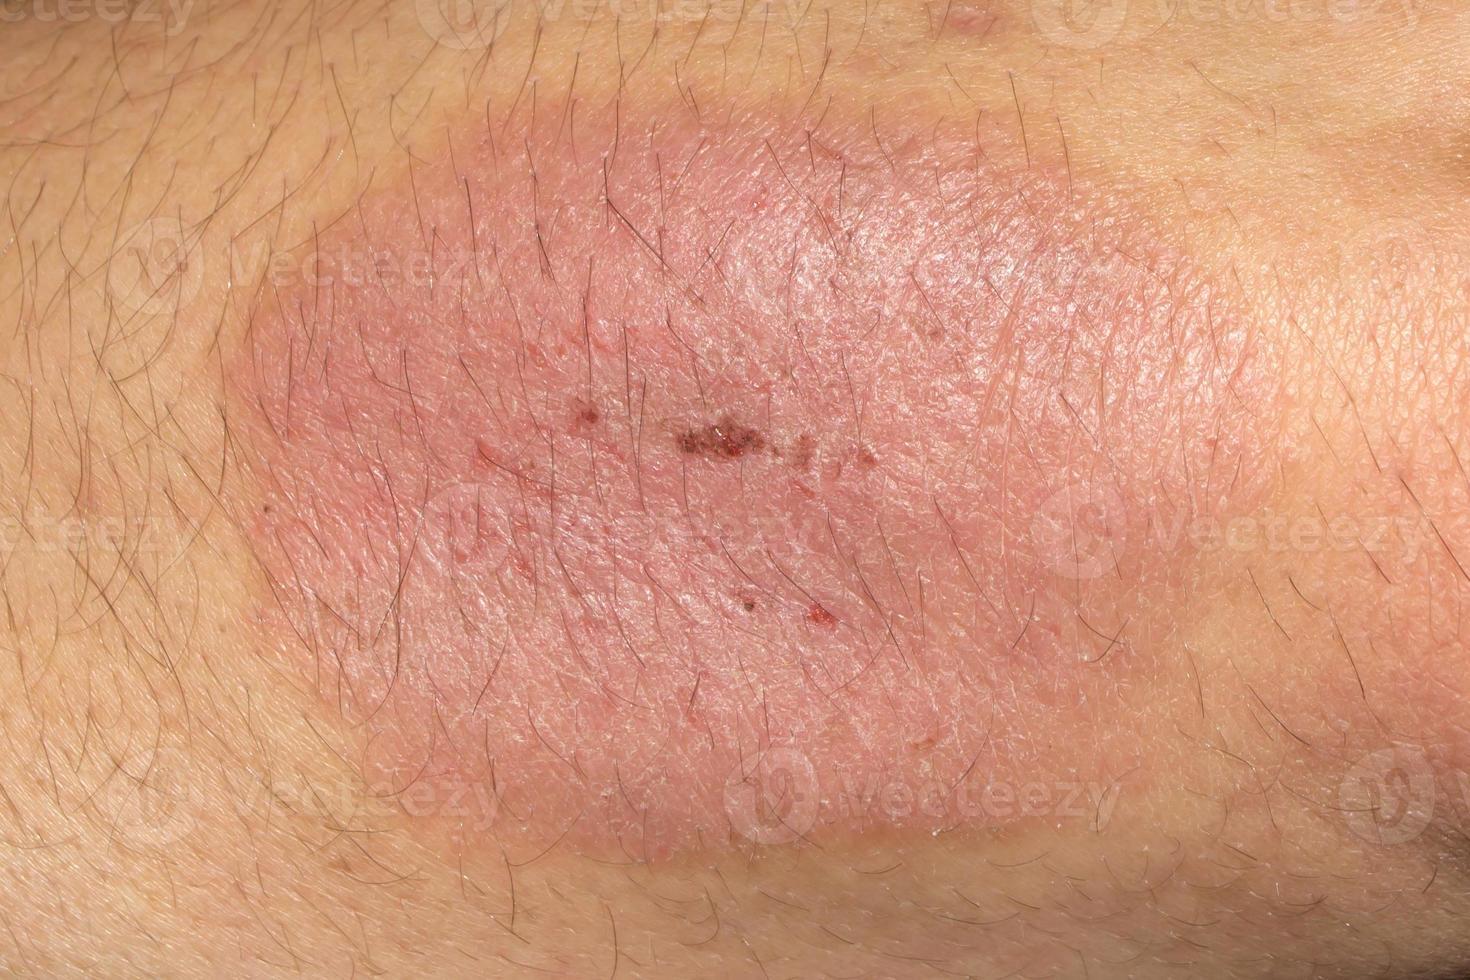 coude de psoriasis photo